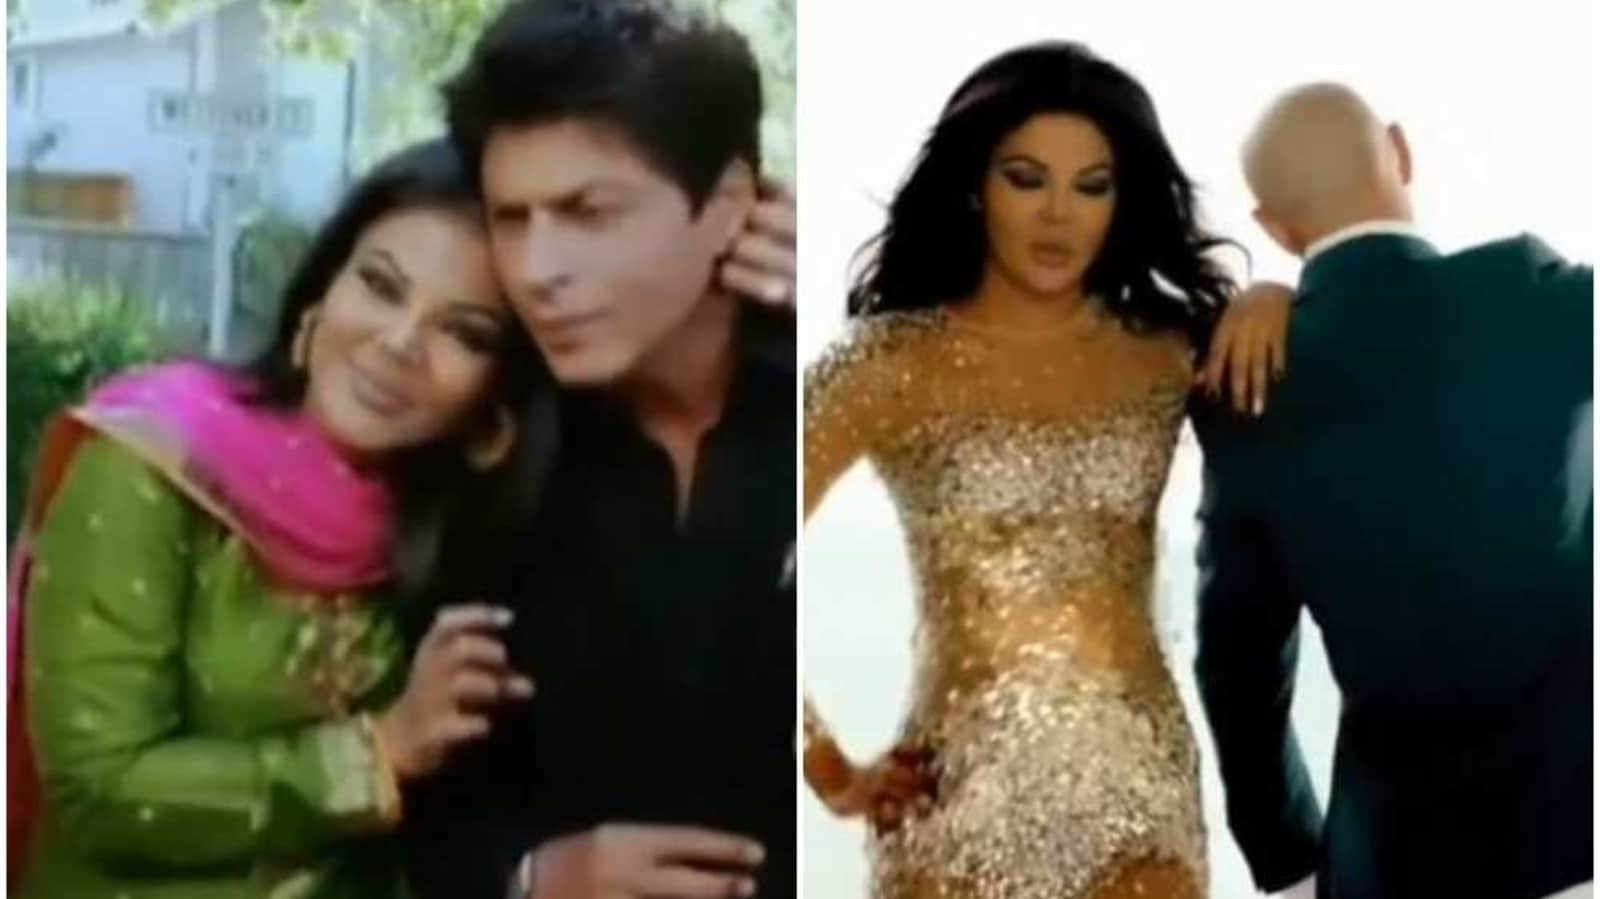 Rakhi Sawant deepfakes again, this time as Kajol and Priyanka Chopra; fan says 'You are more attractive' - Hindustan Times